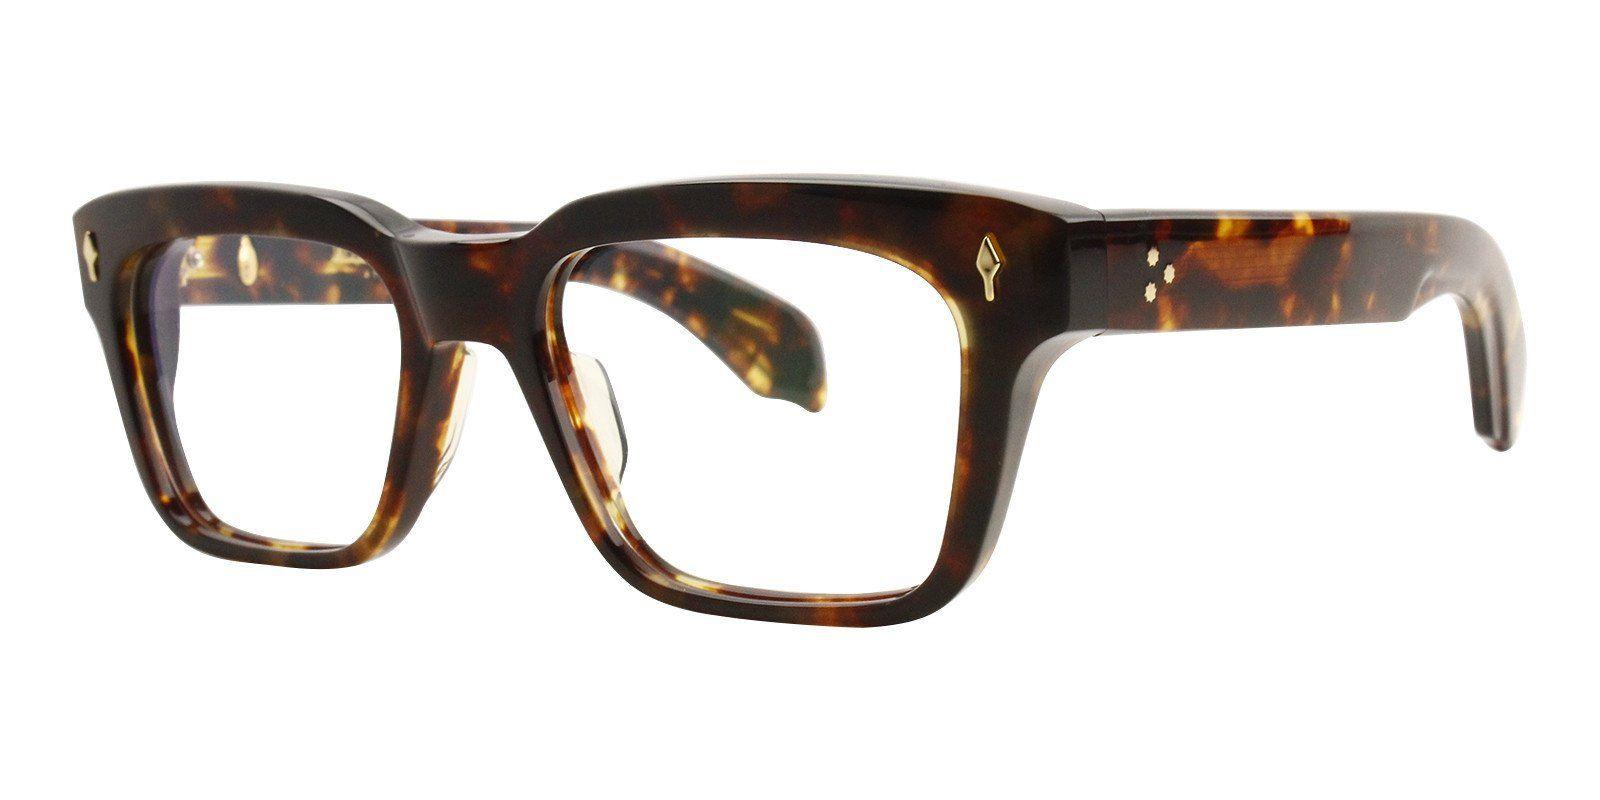 479cdb979b5 Jacques Marie Mage - Molino Brown-eyeglasses-Designer Eyes Eyeglasses